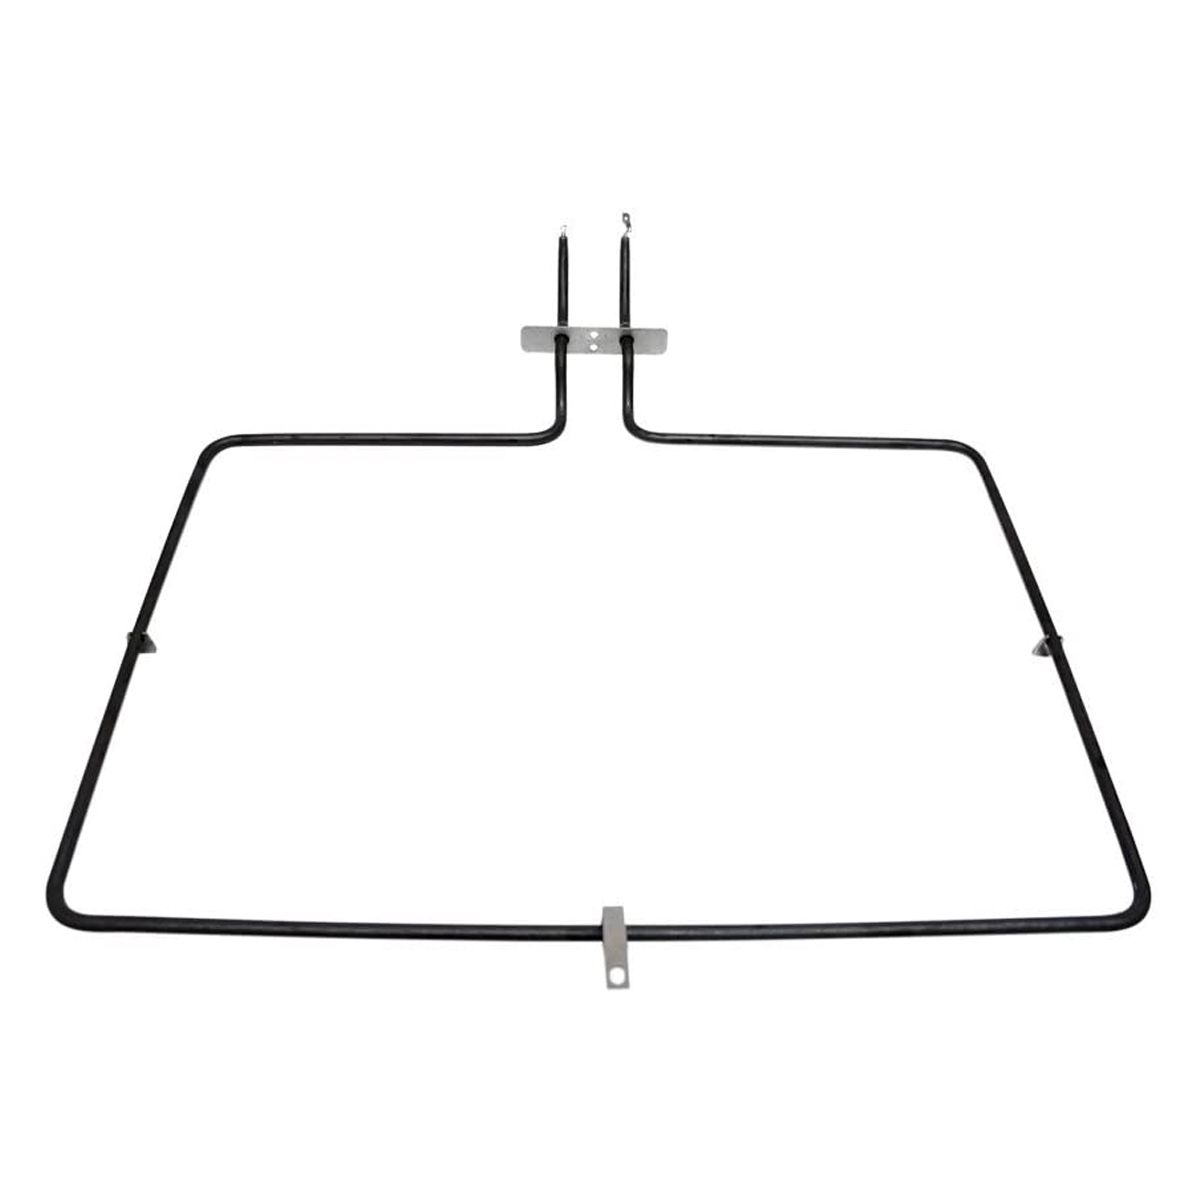 Whirlpool WFE540H0AS0 Oven Bake Element (Lower) Genuine OEM